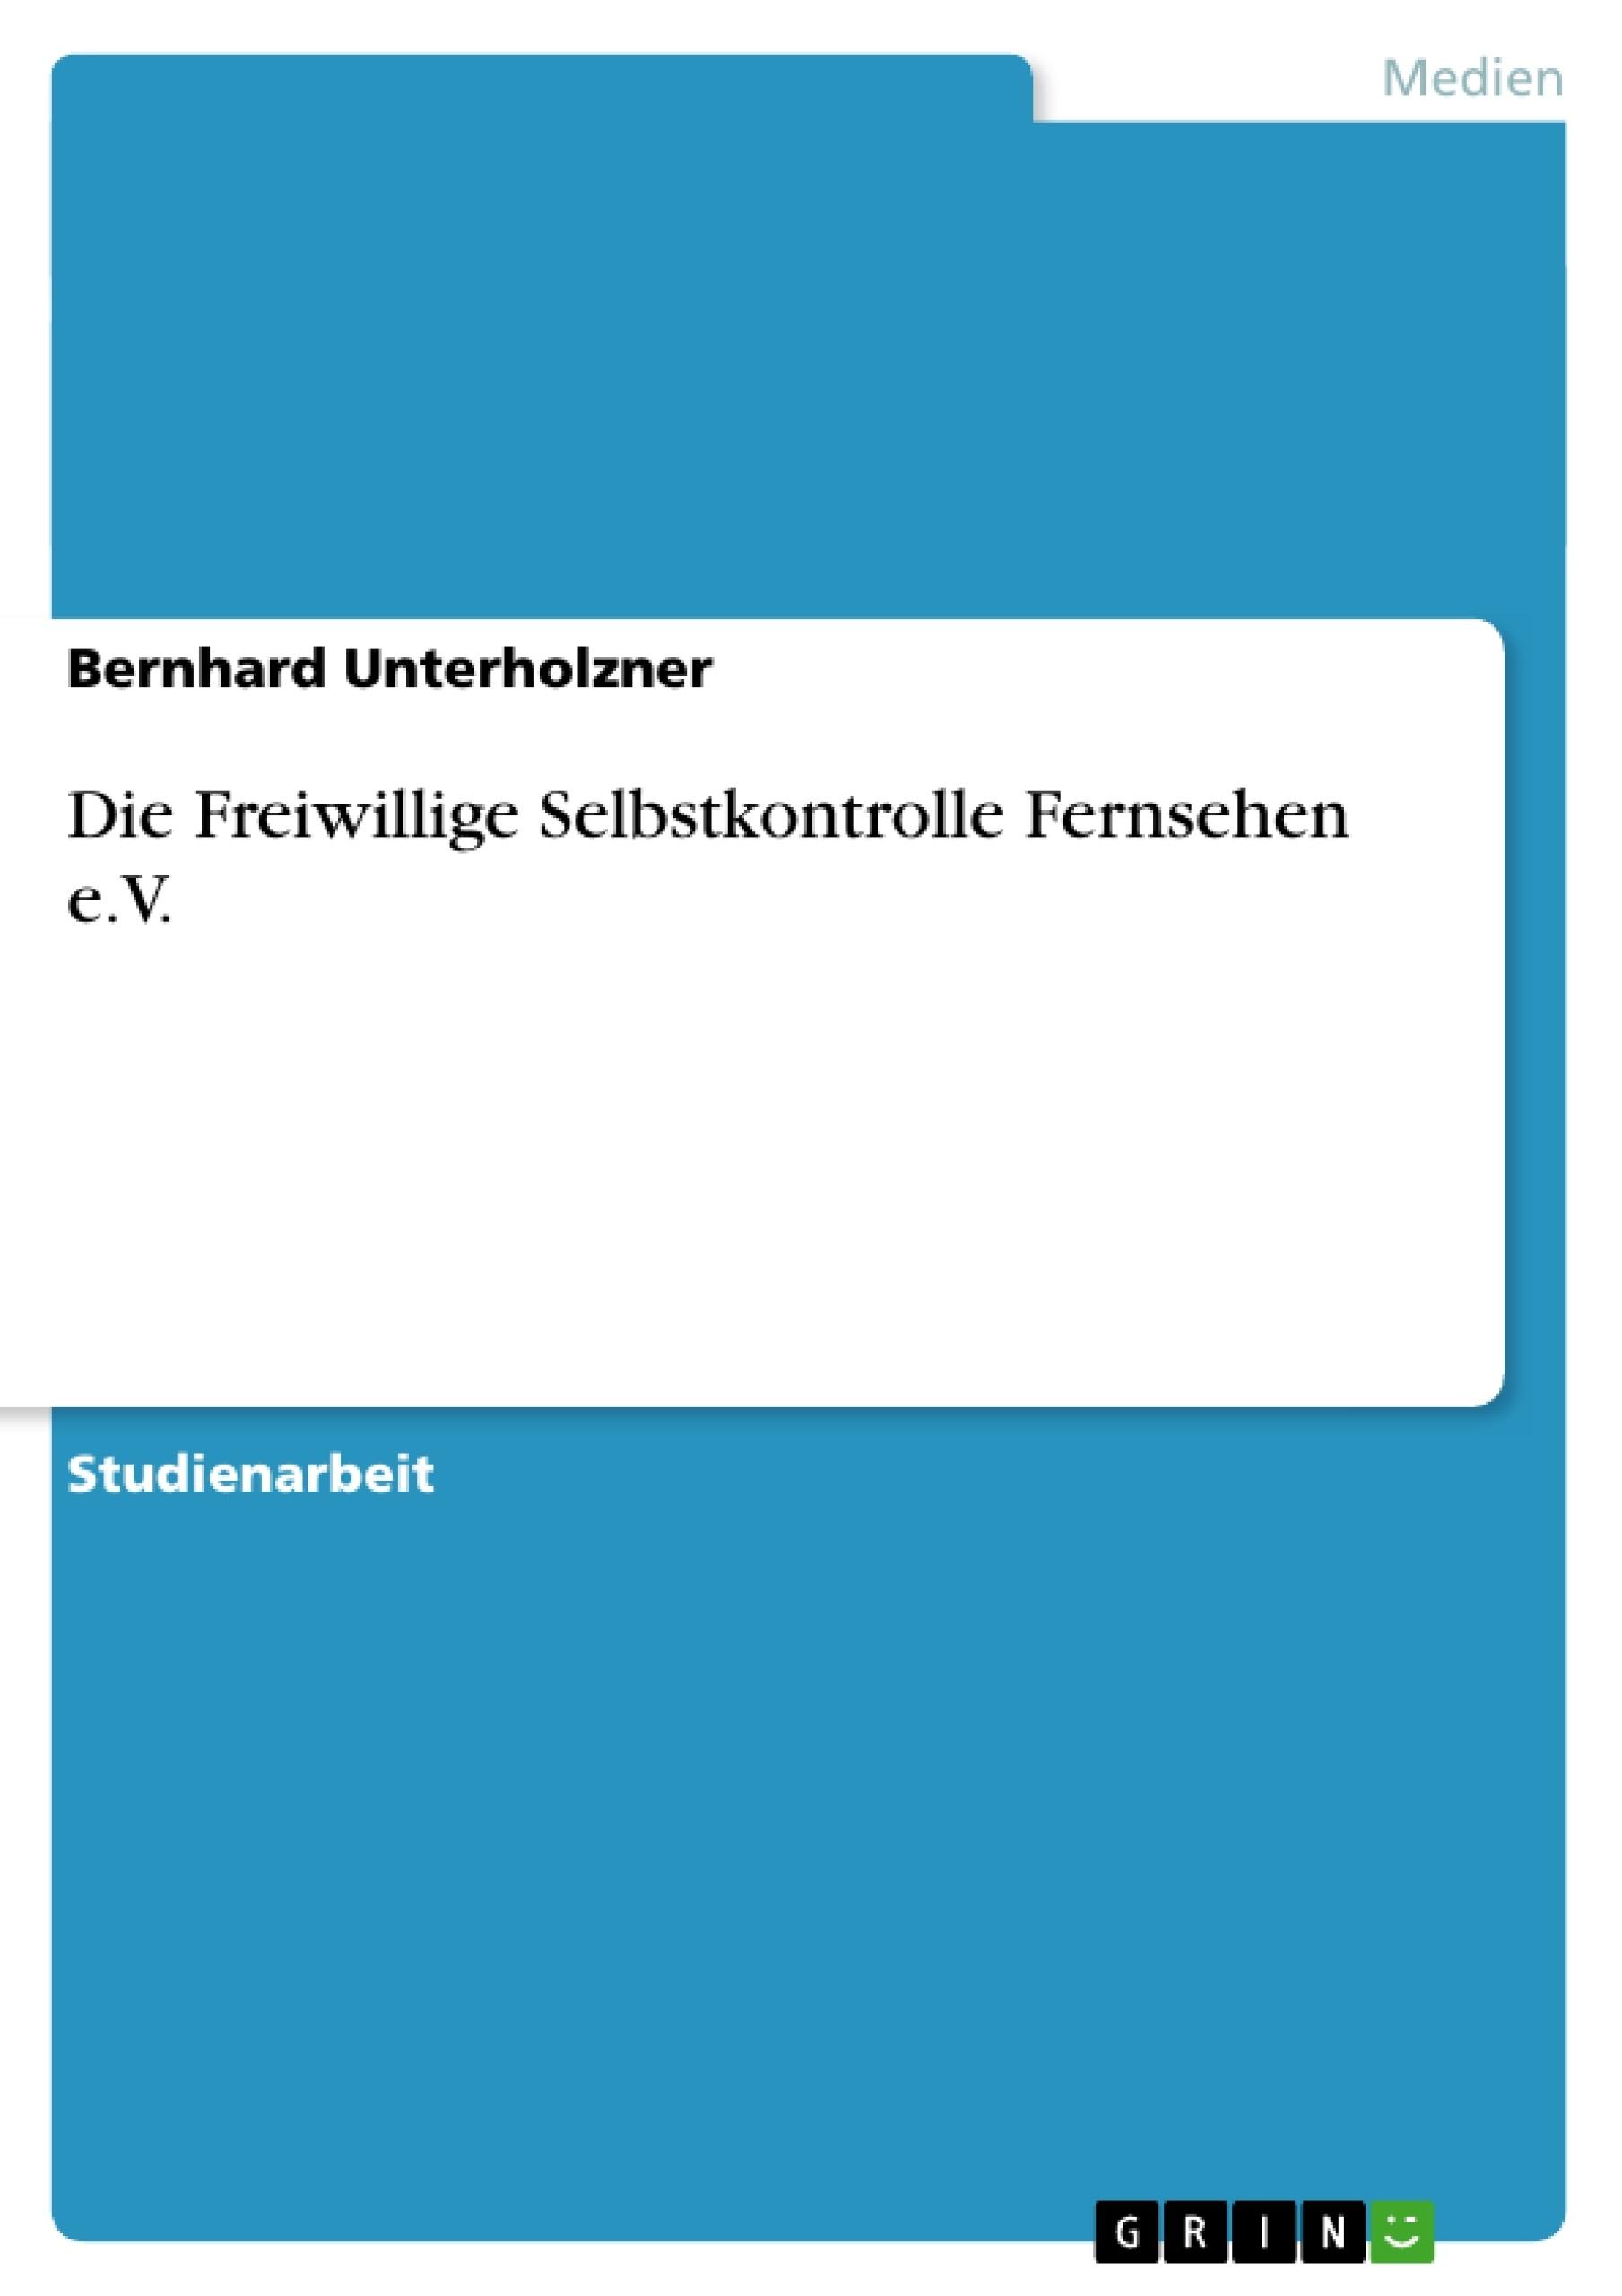 Titel: Die Freiwillige Selbstkontrolle Fernsehen e.V.